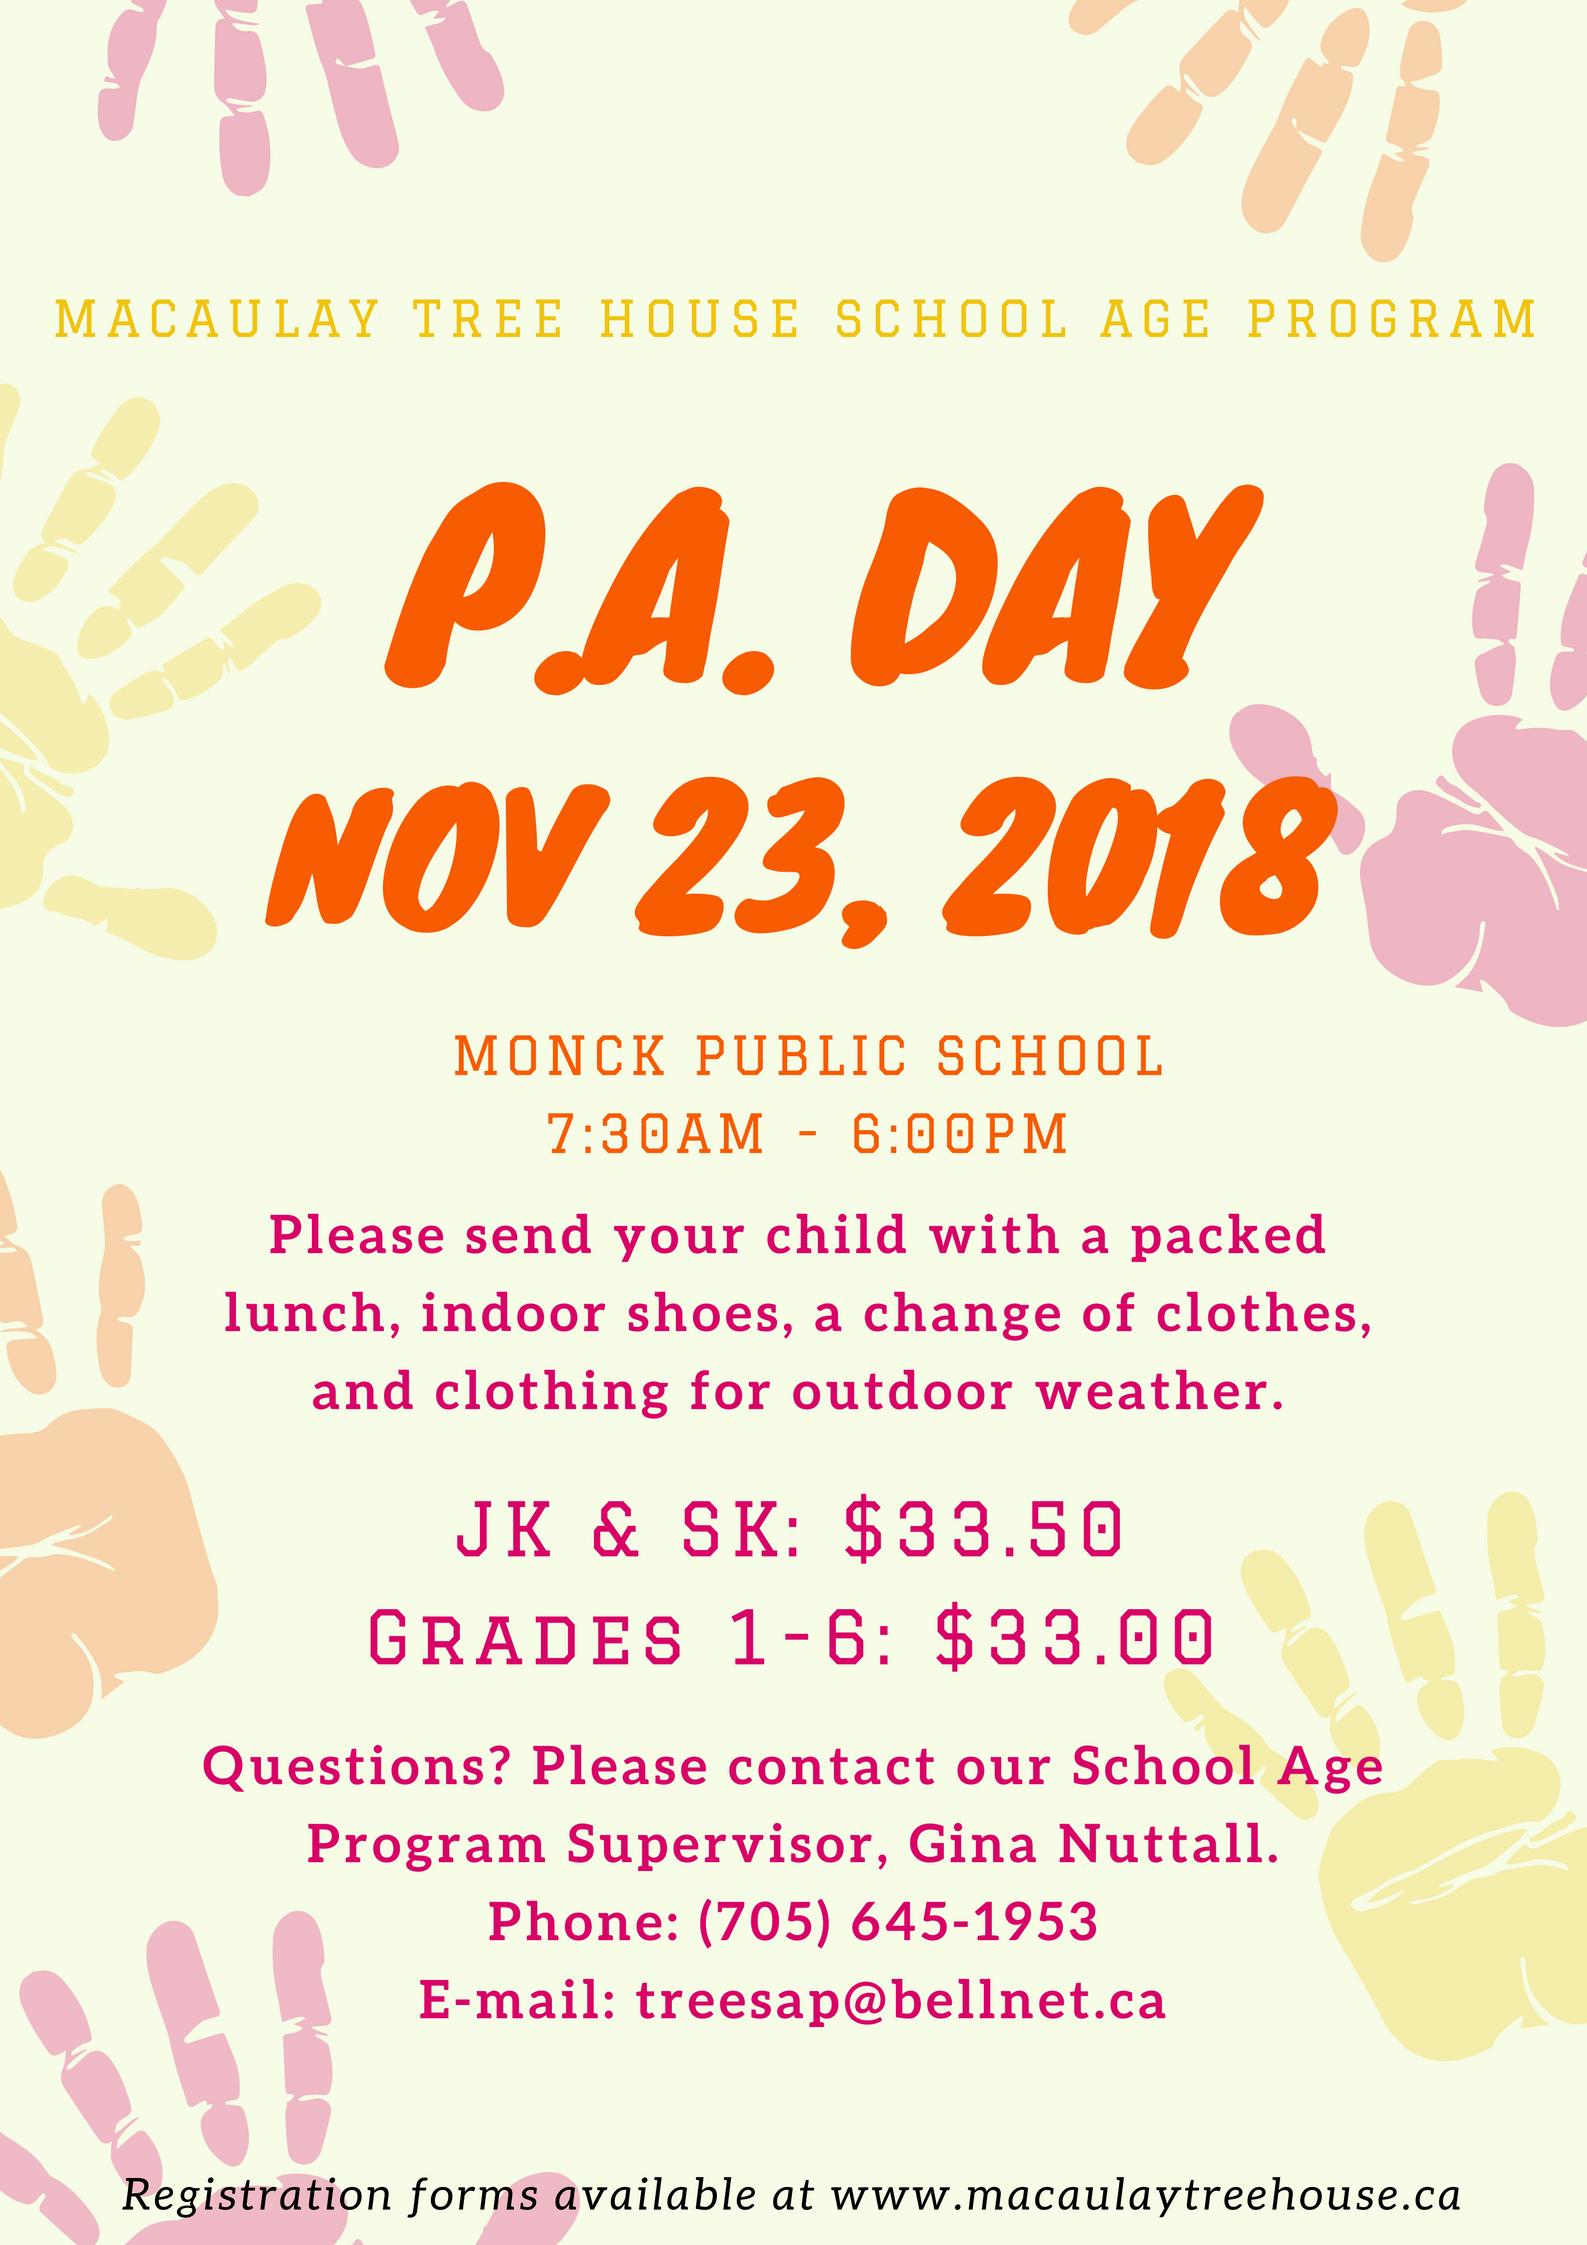 P.A. Day: November 23, 2018